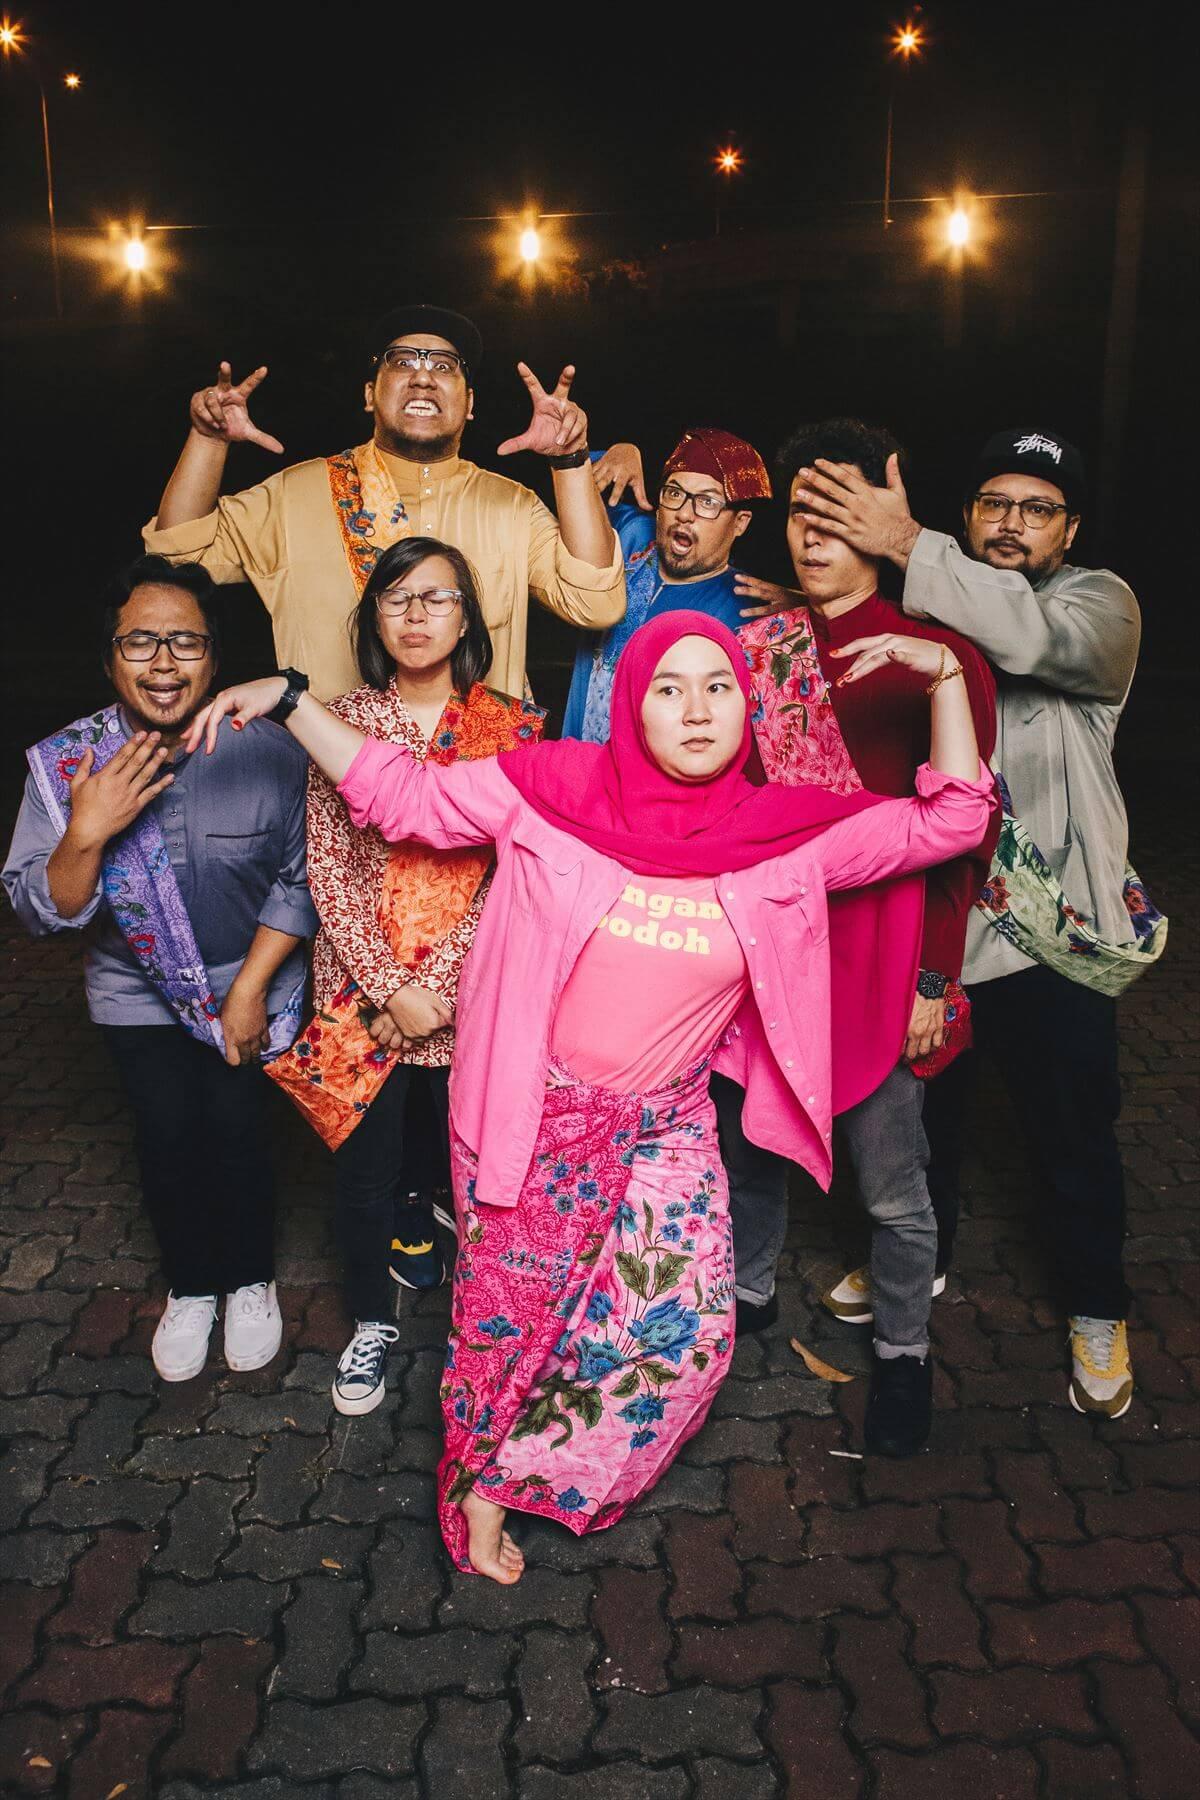 Interview:多国籍国家で、異国文化を自由に選ぶ|マレーシアのトップ・インディーズアーティストThe Venopian Solitude interview200424_venopiansolitude_08